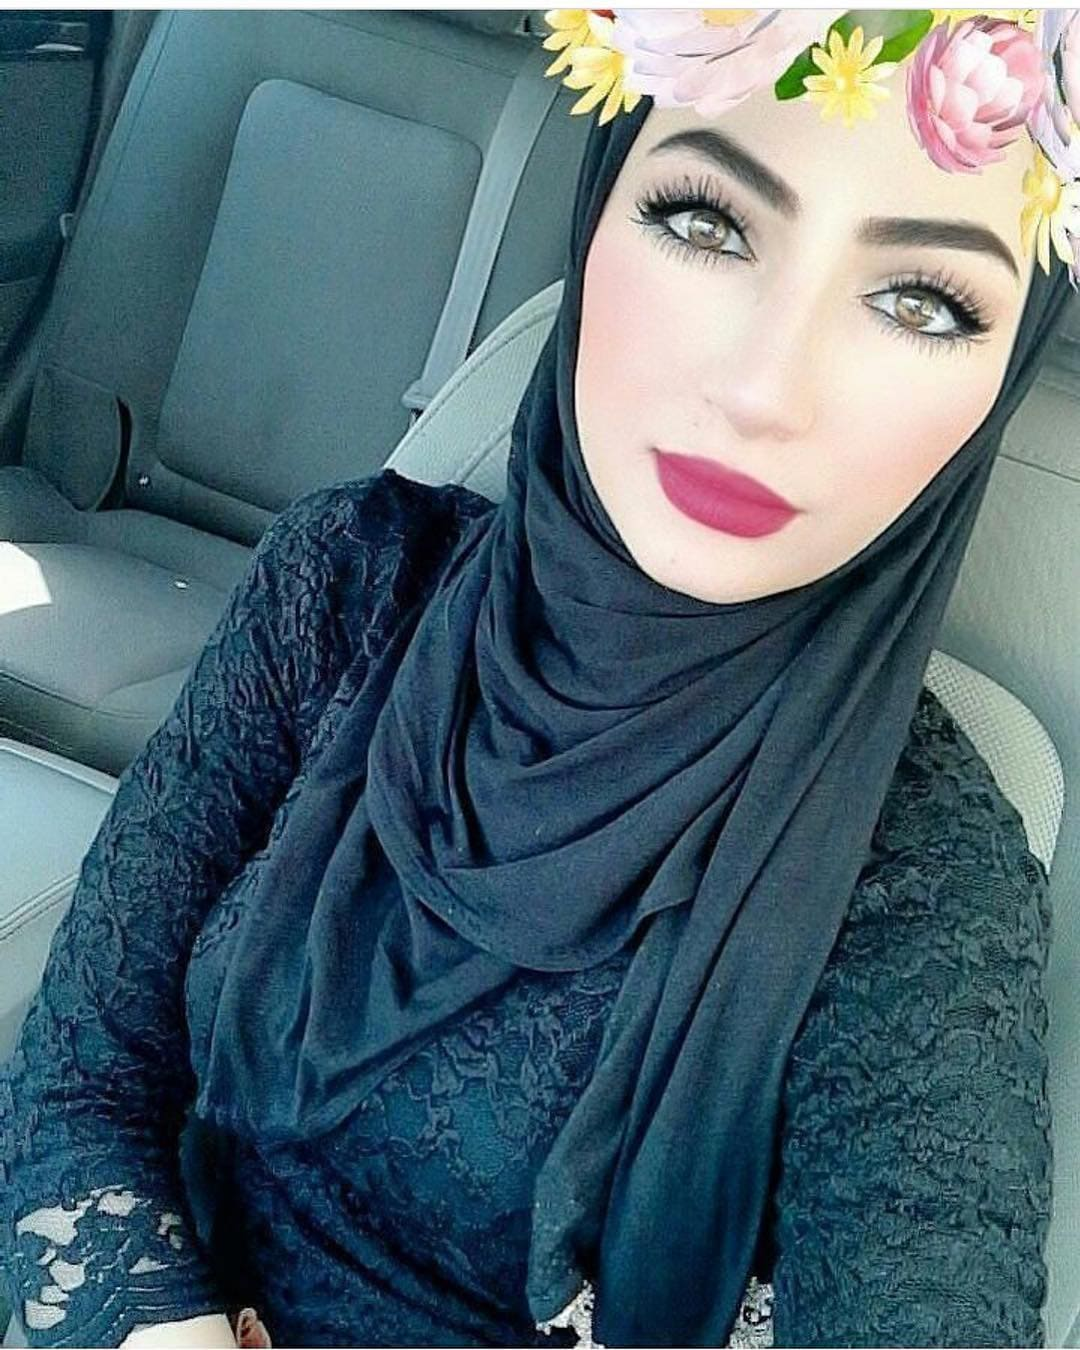 صورة صور بنت مصر , اجمل صور بنات فى مصر